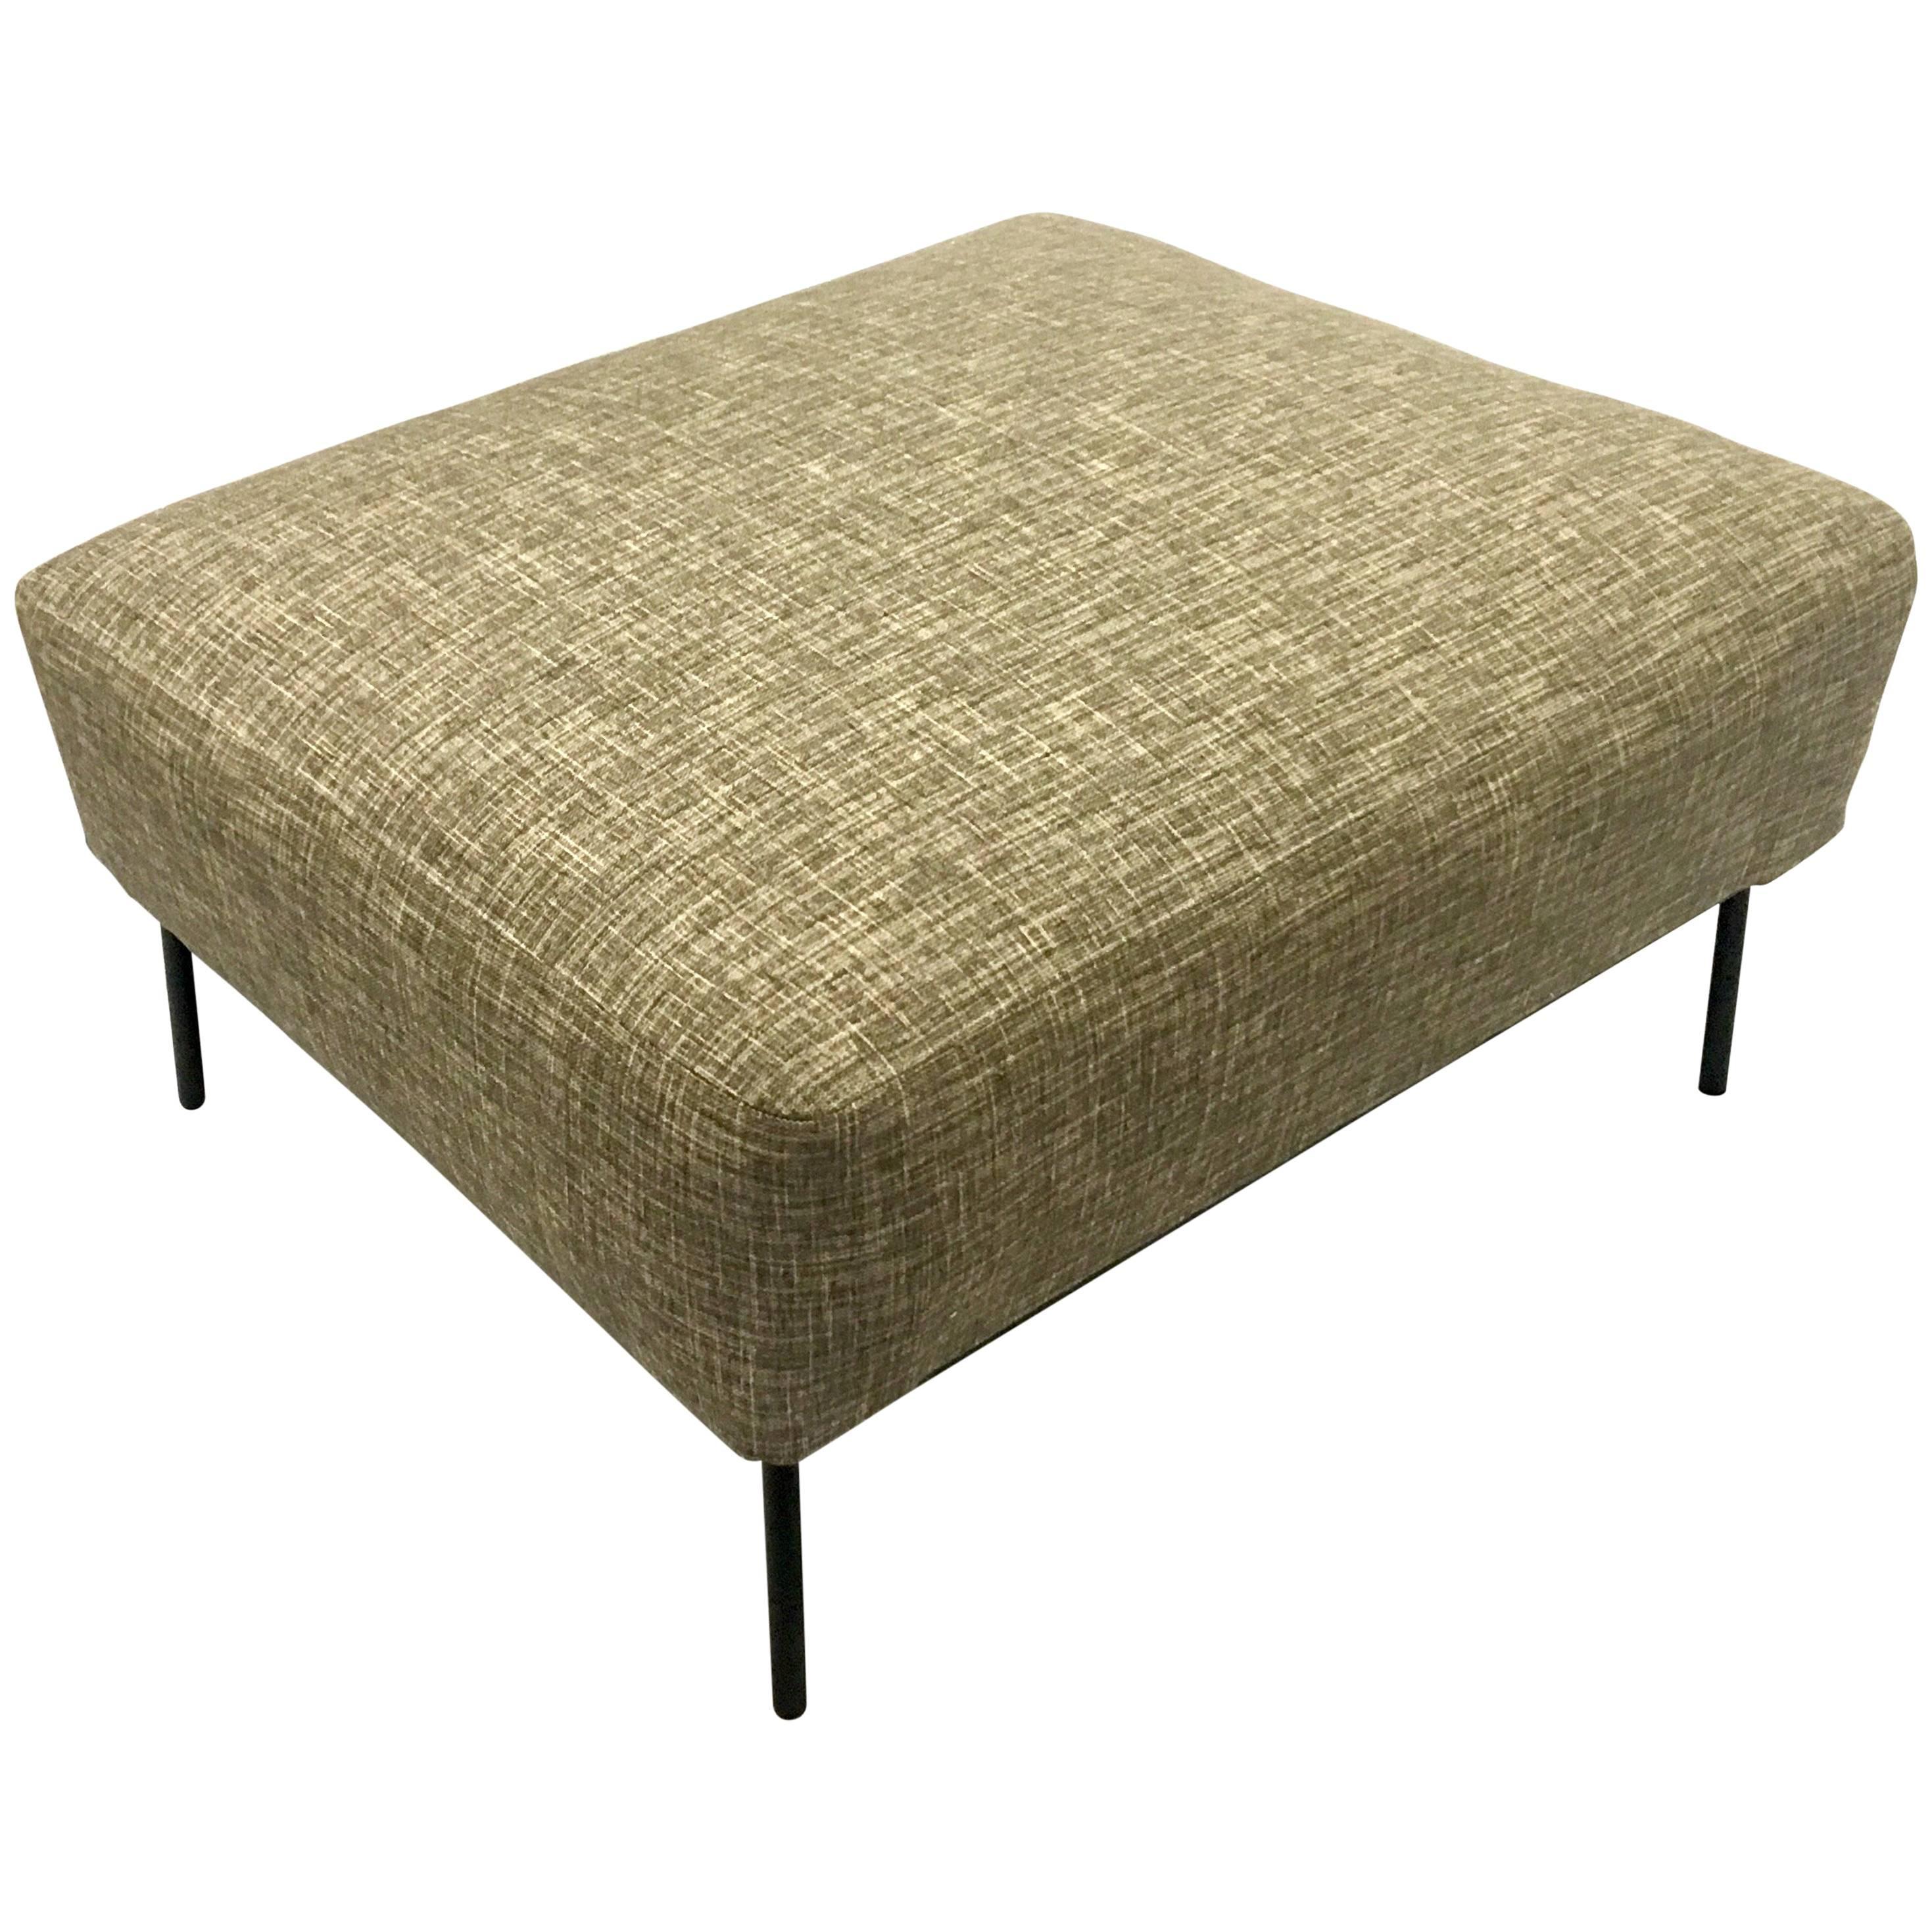 1950s, American Mid-Century Modern Upholstered Spring Ottoman on Iron Base